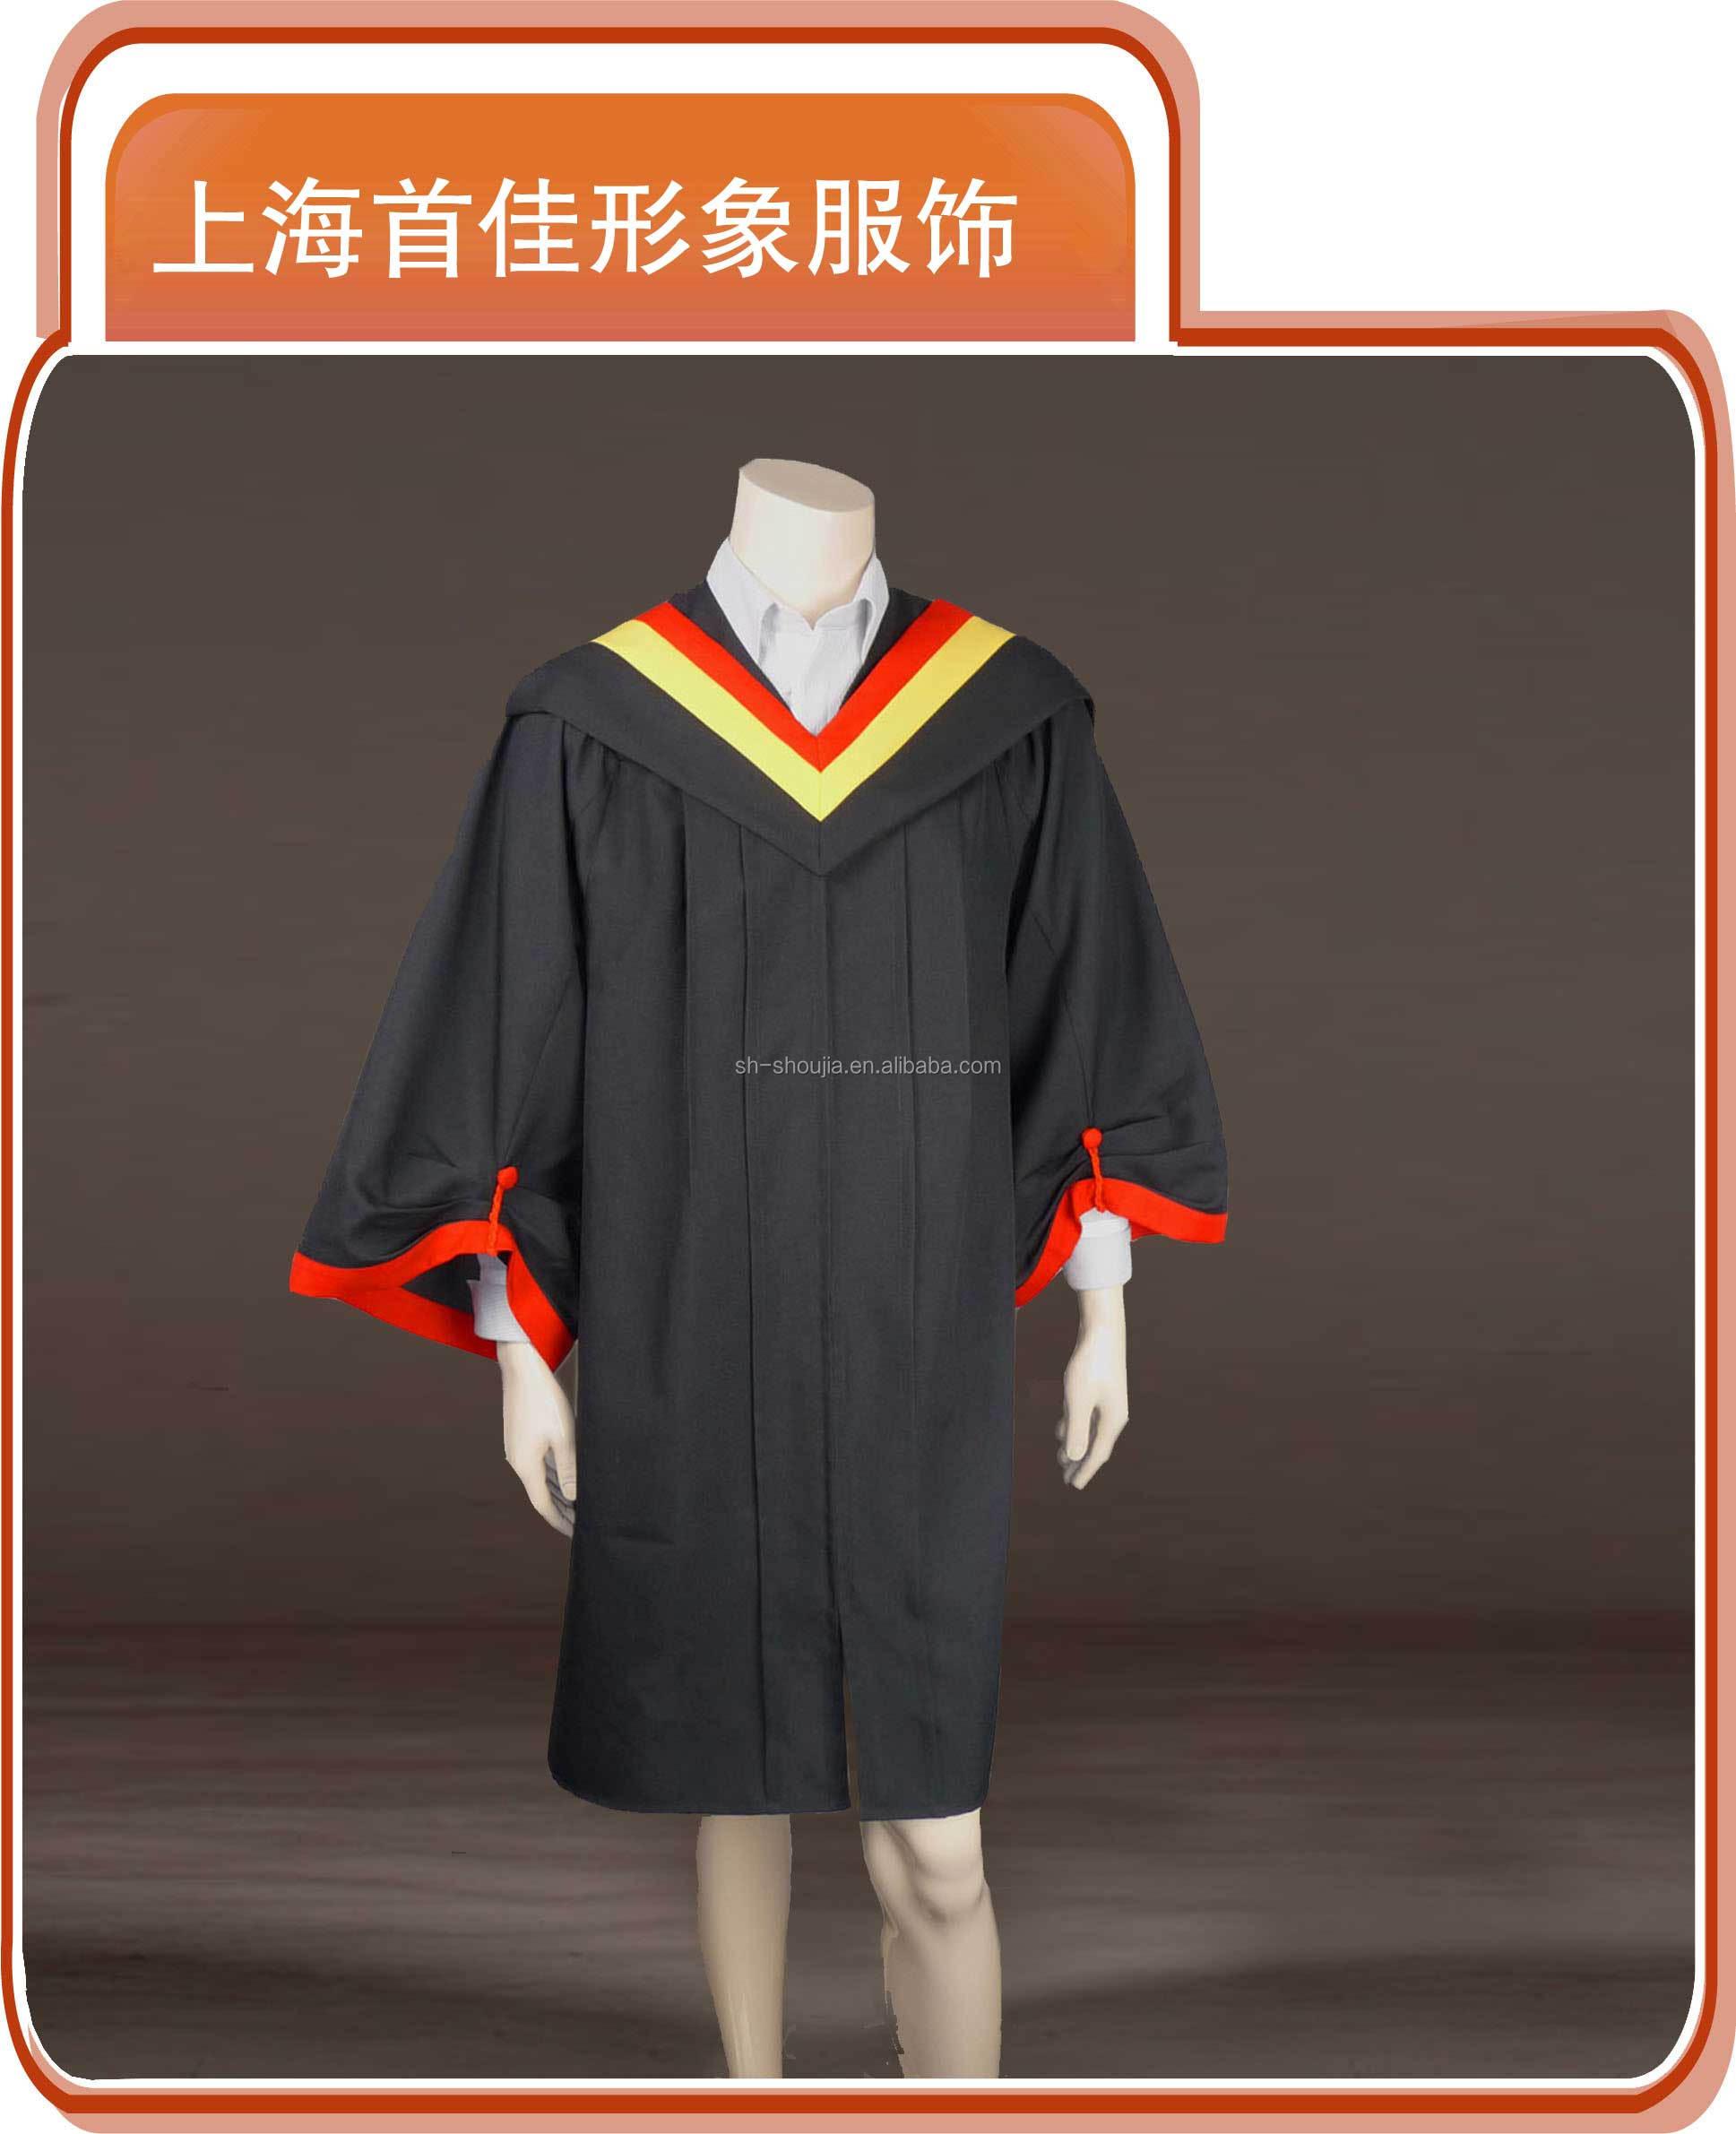 2015 Shanghai Shoujia High School Graduation Cap And Gown,Univeisity ...